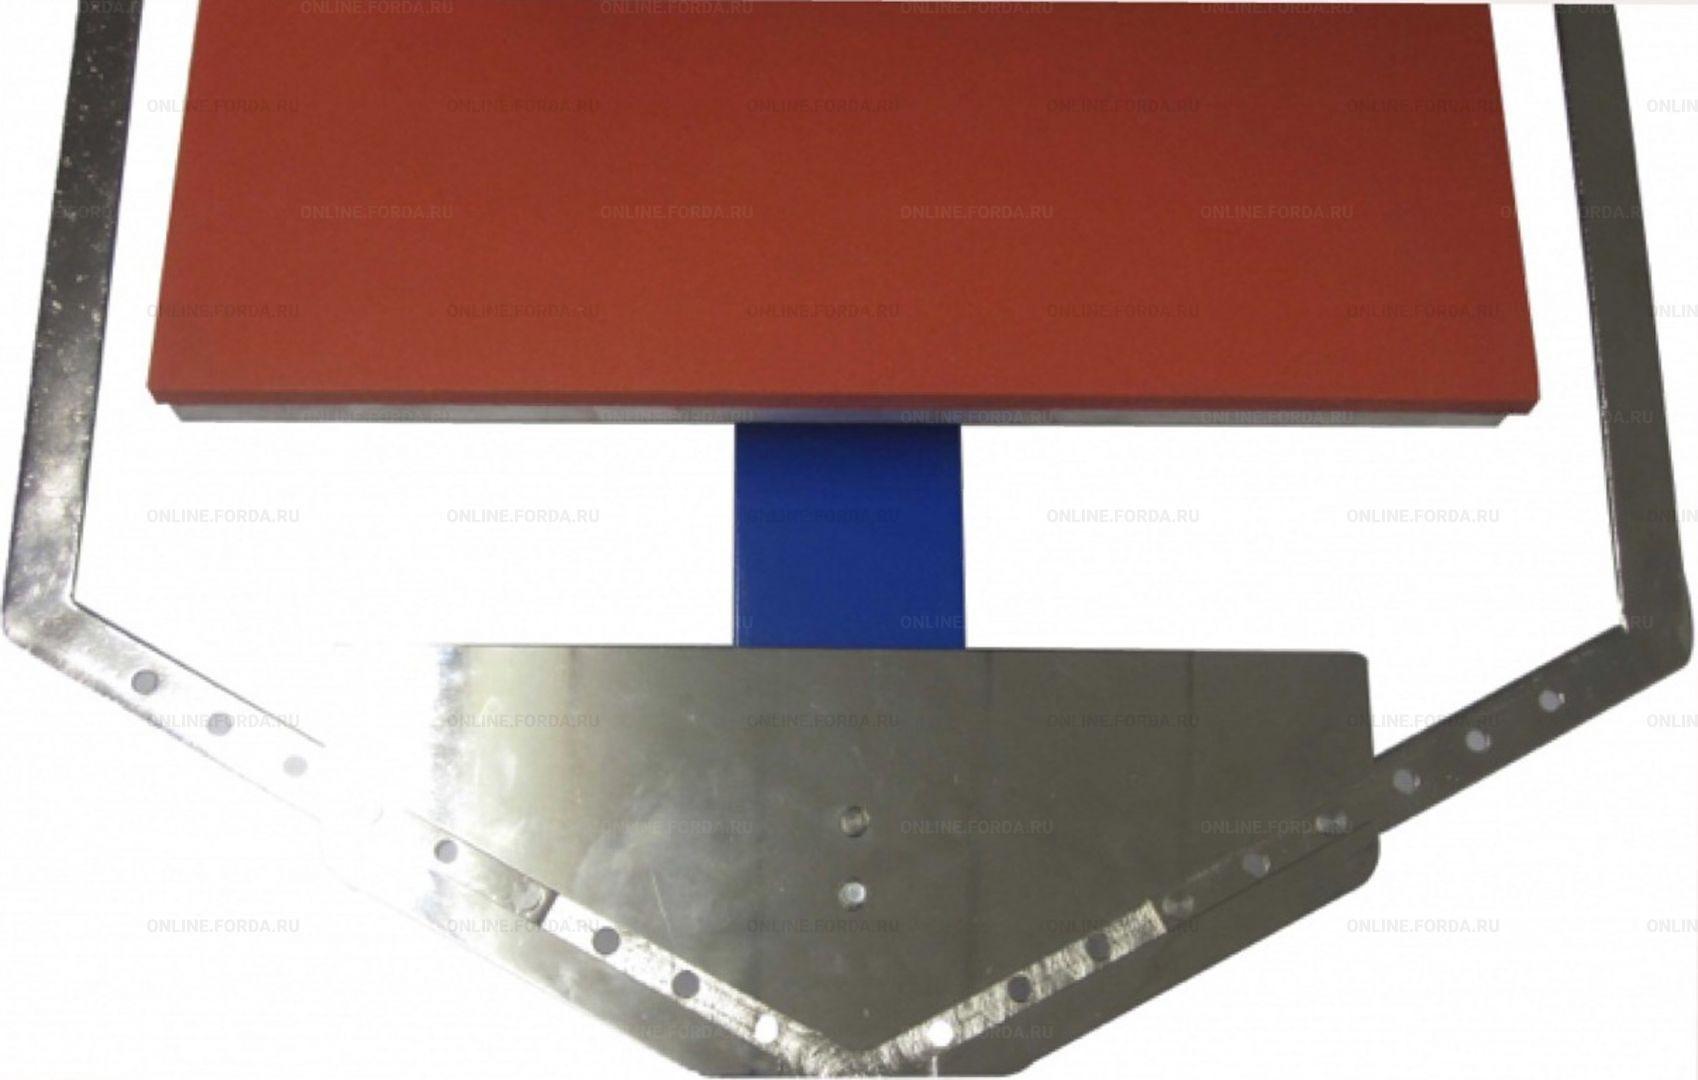 Рамка для позиционирования футболок Kit for textile для термопереноса